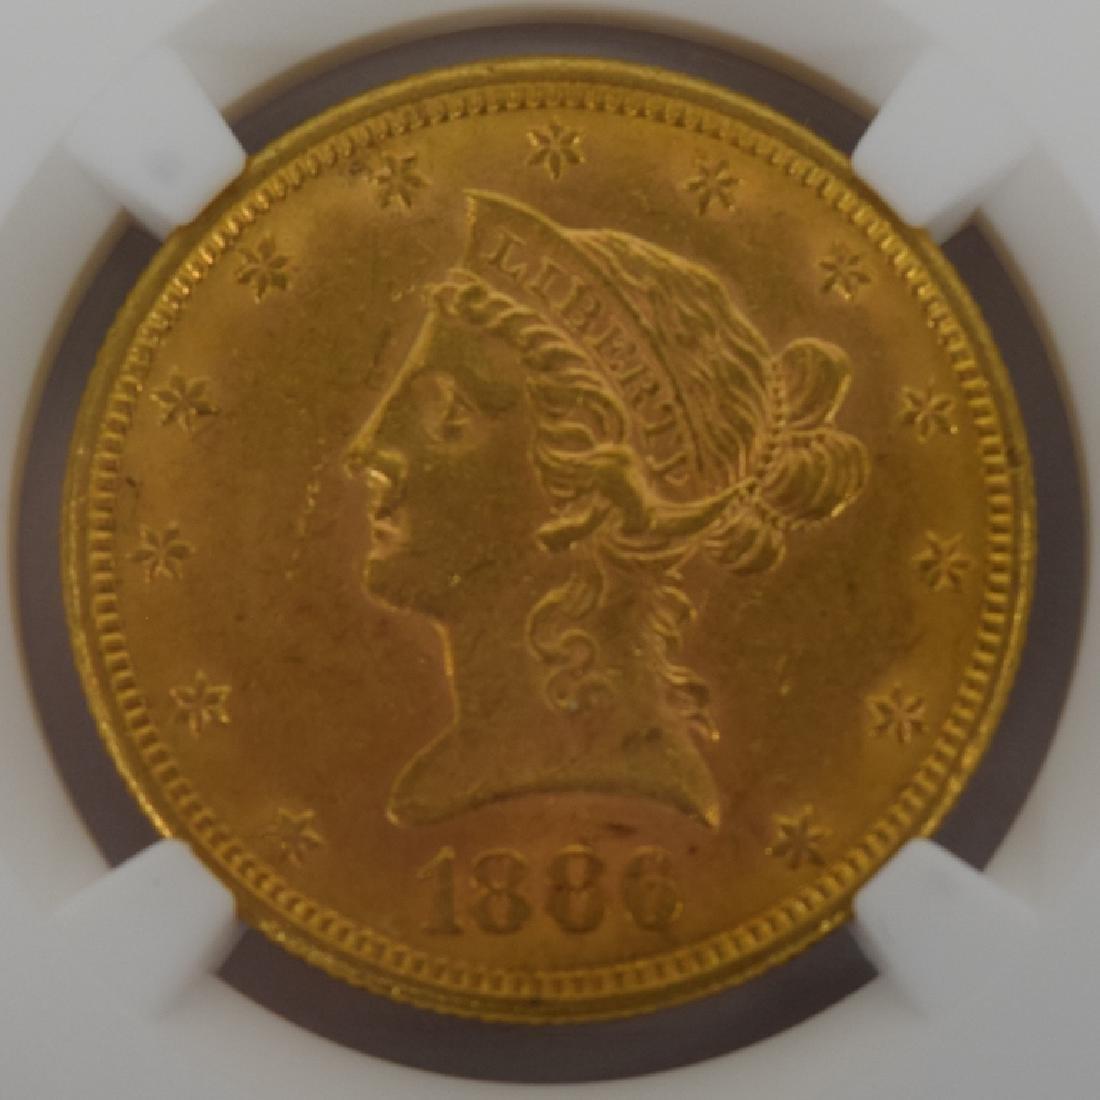 1886-S LIBERTY EAGLE $10 GOLD COIN NGC AU58 - 5